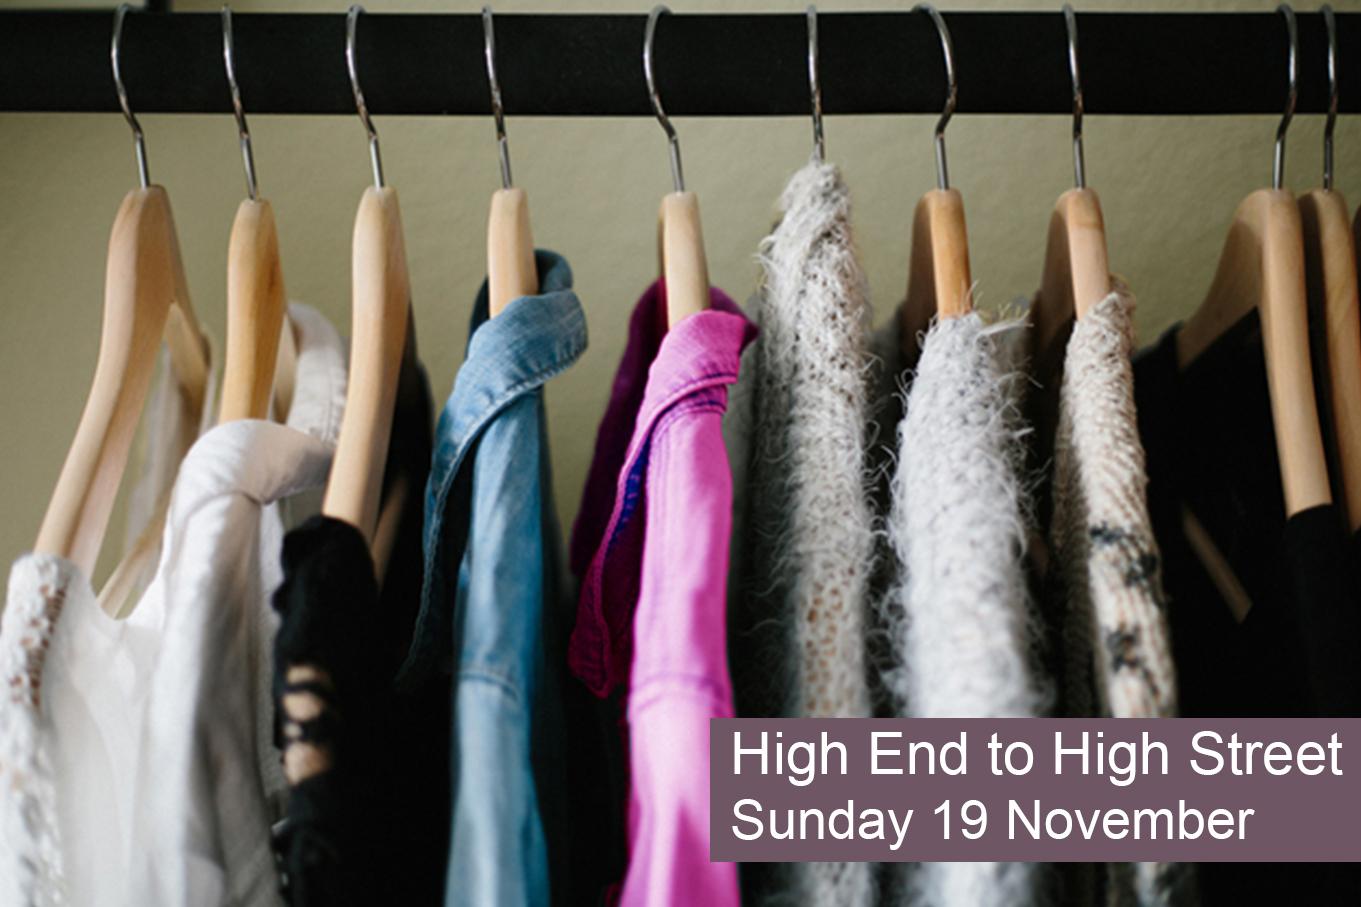 Sunday 19 November